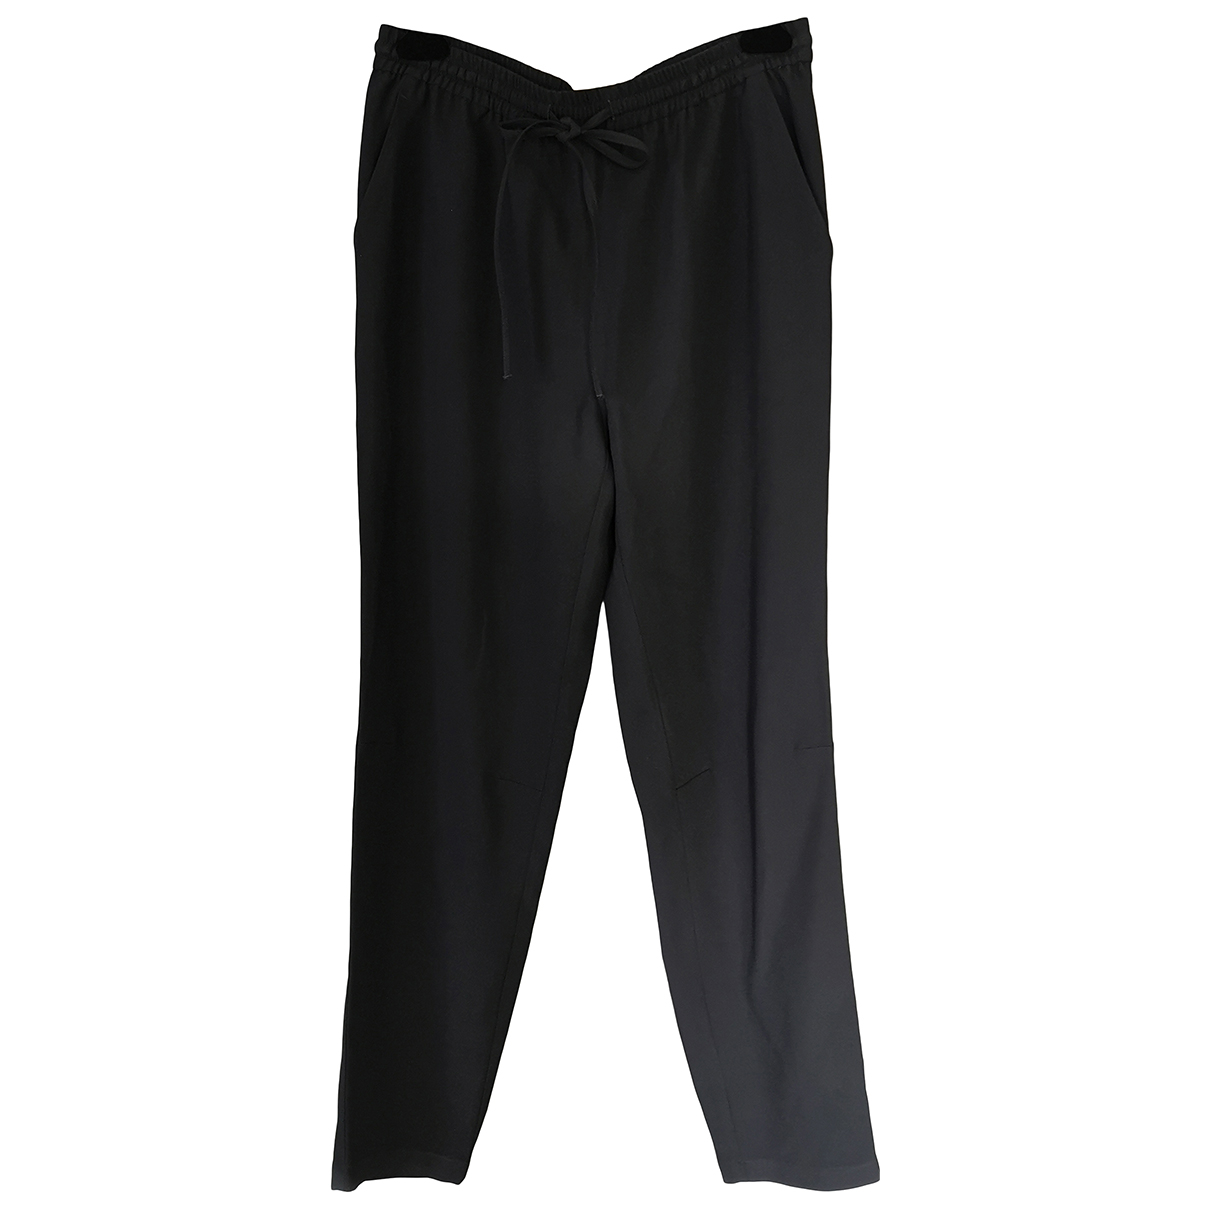 Red Valentino Garavani N Black Trousers for Women 44 IT